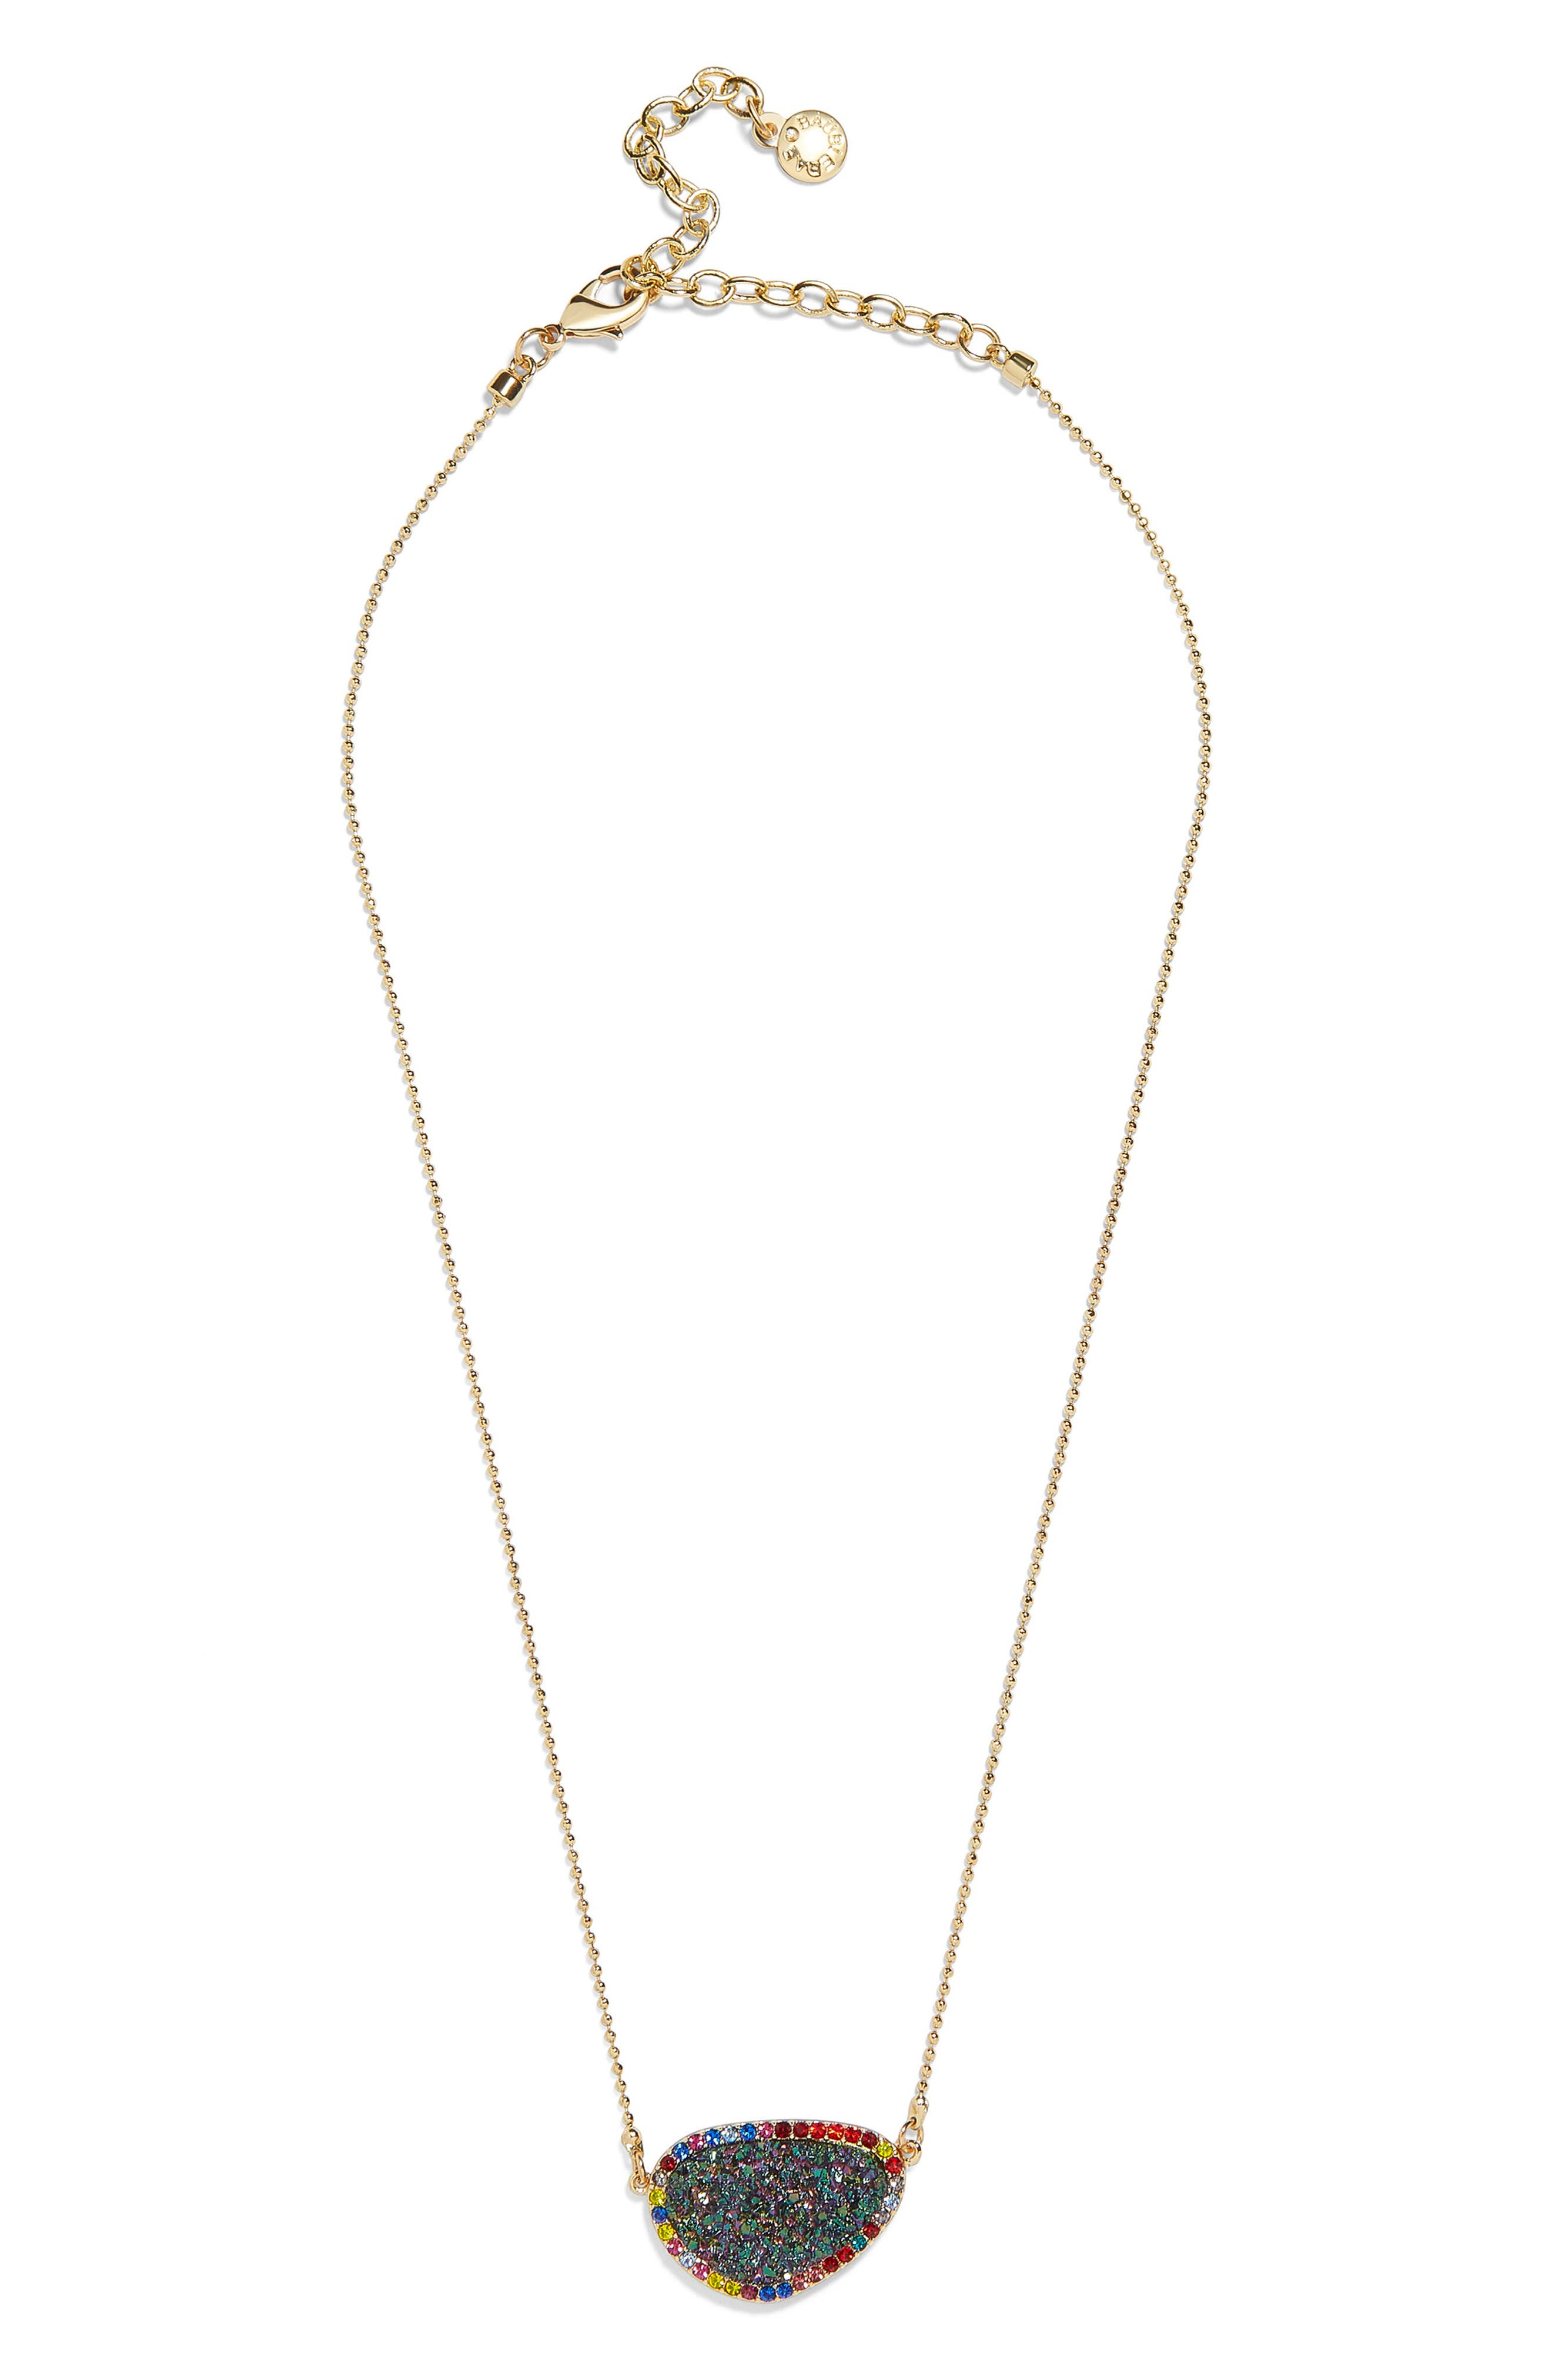 BAUBLEBAR Kerisa Drusy Pendant Necklace, Main, color, 440